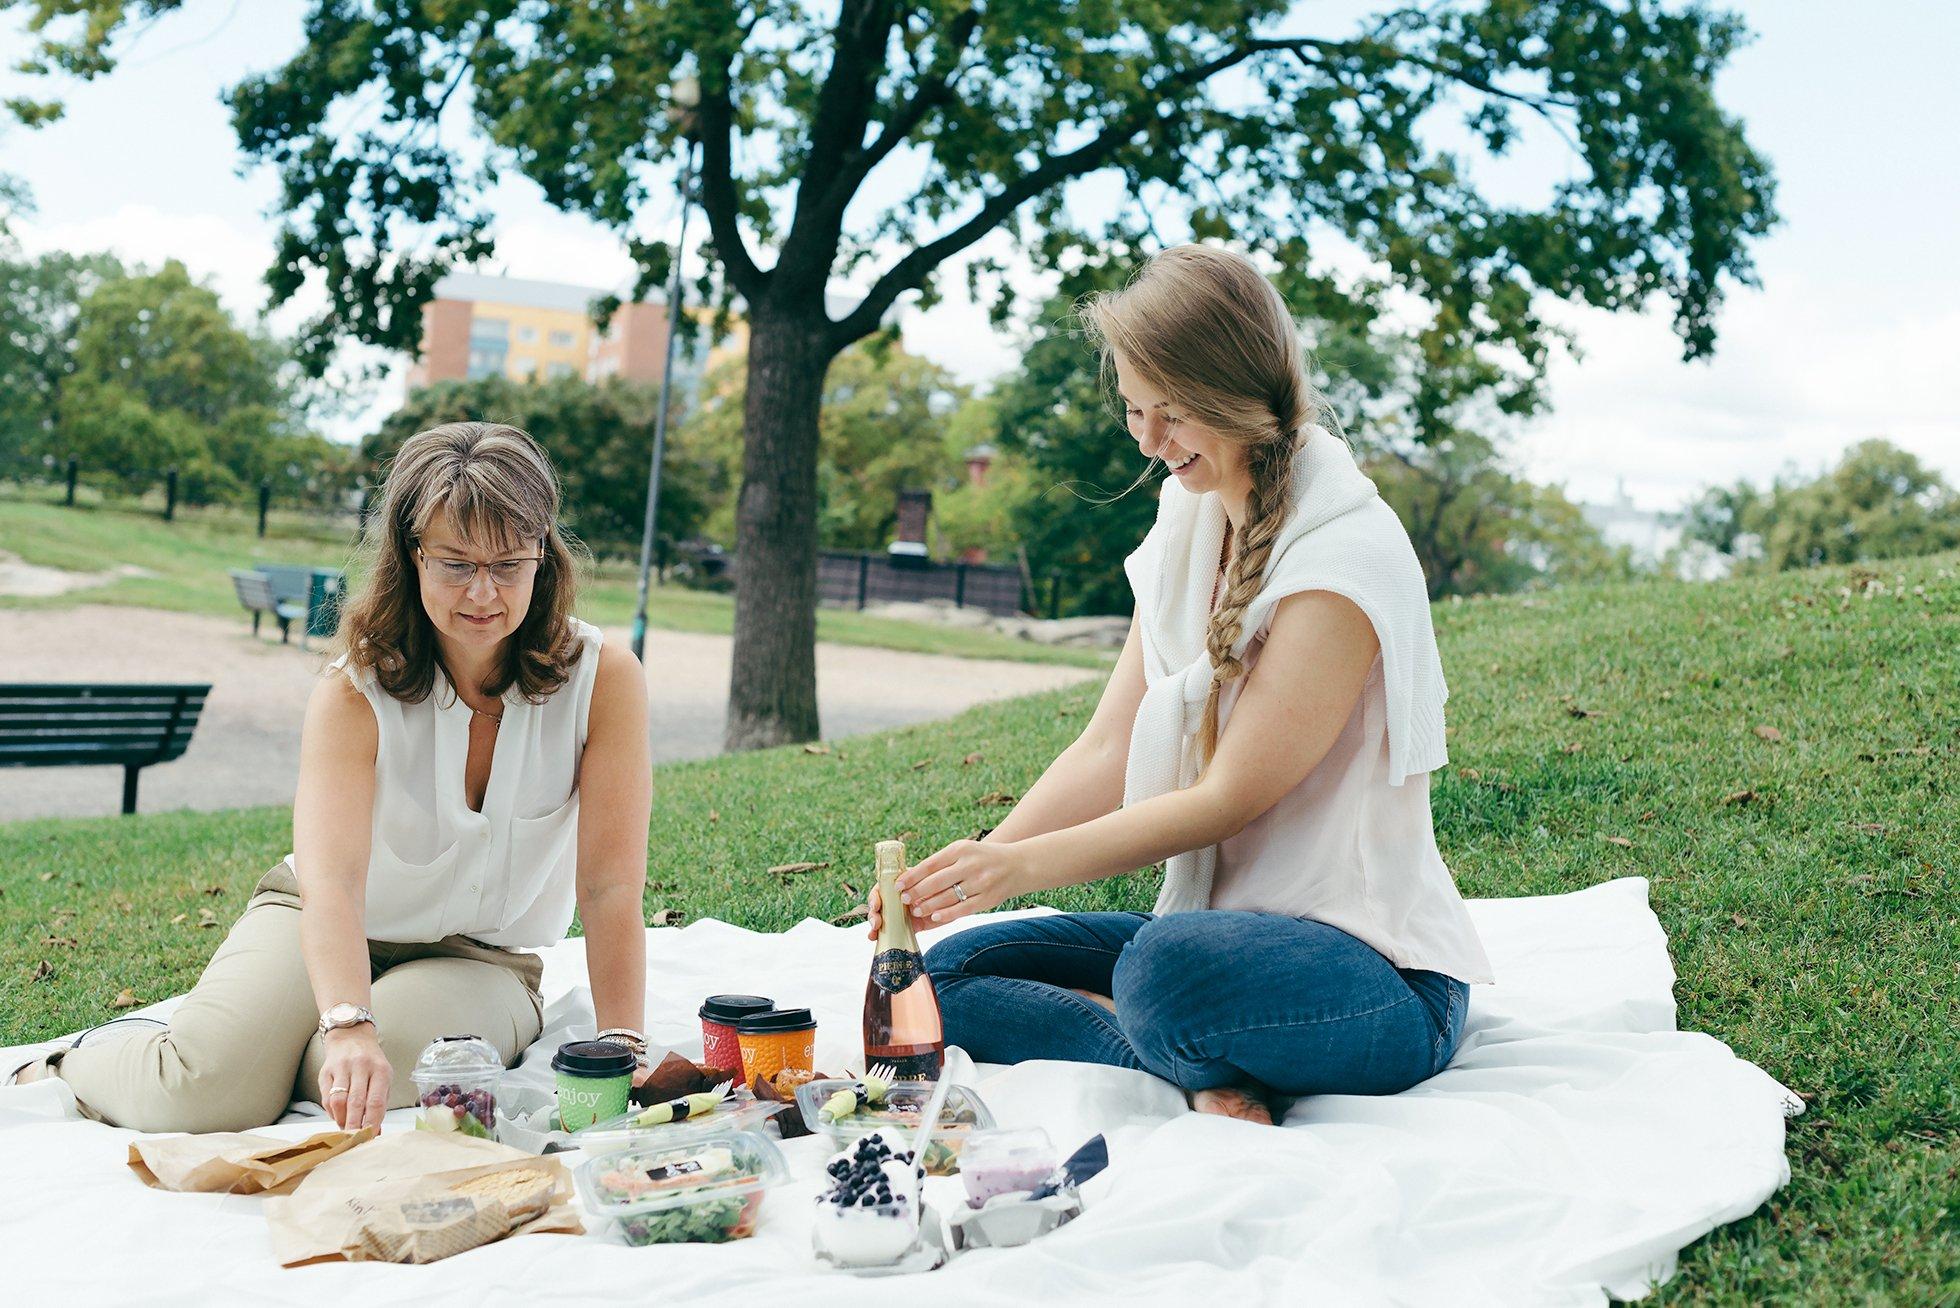 Smo&Fro, piknik eväät